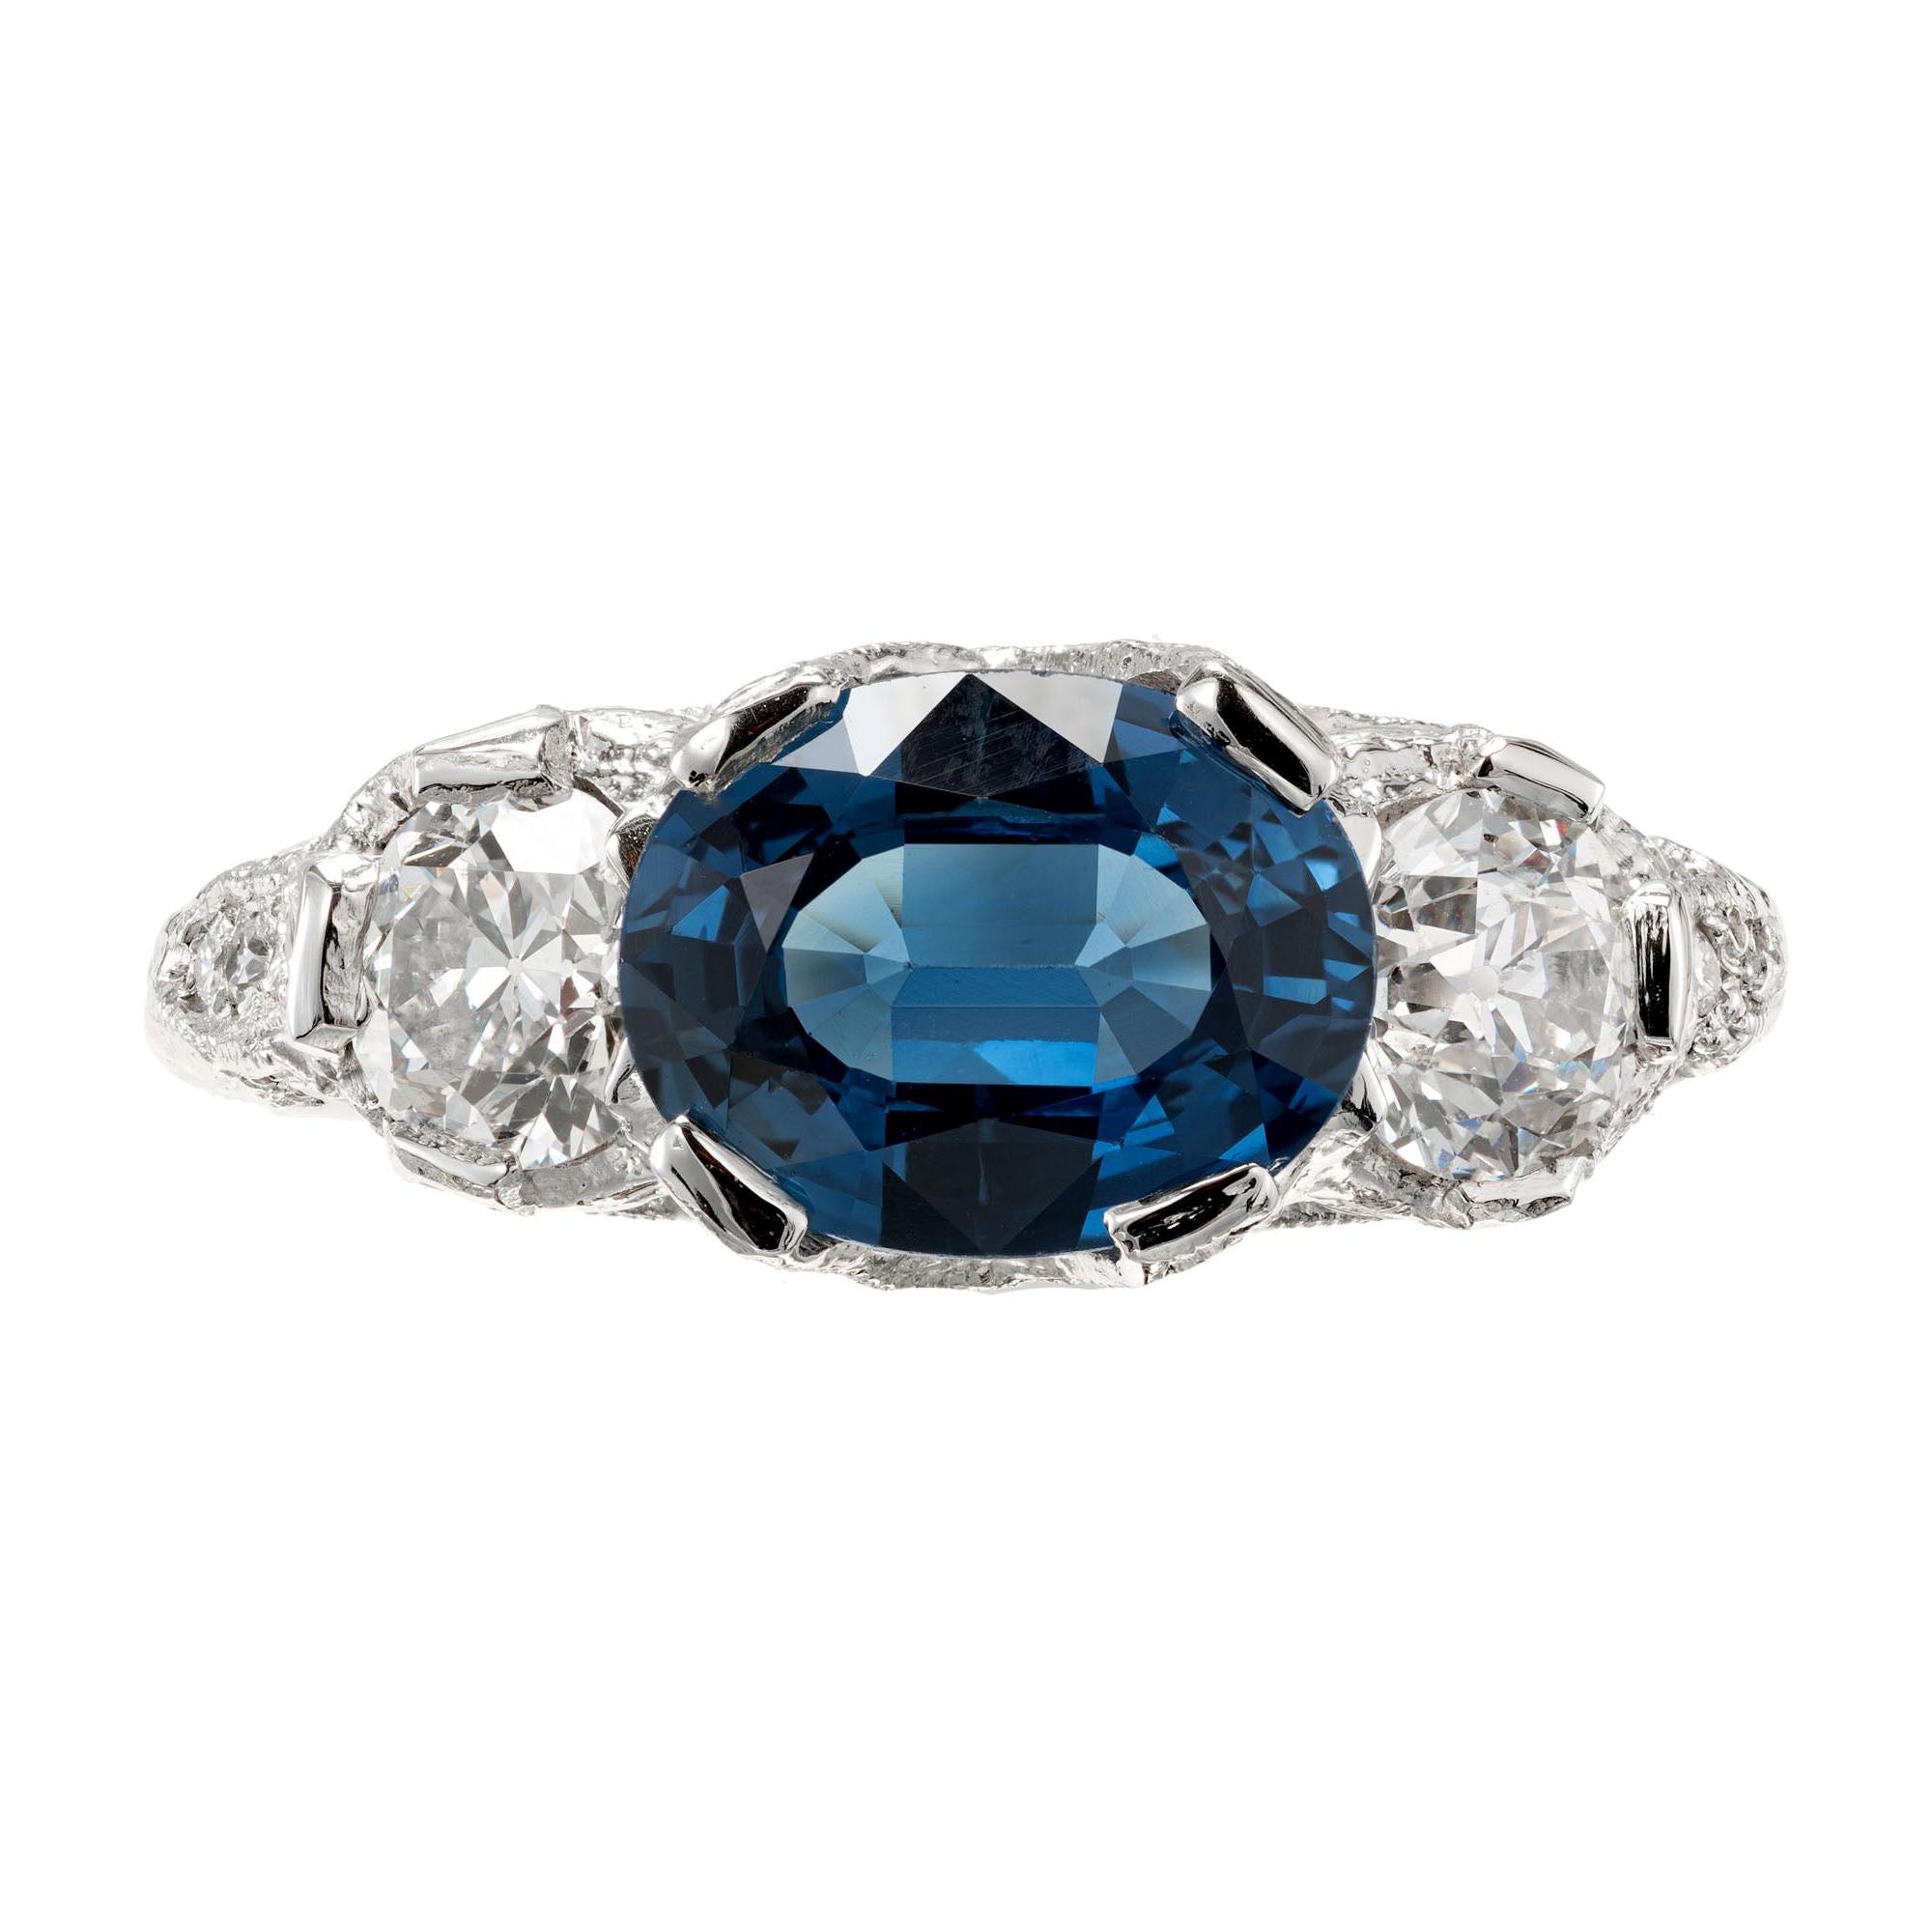 Peter Suchy GIA Certified 2.13 Carat Sapphire Diamond Platinum Engagement Ring